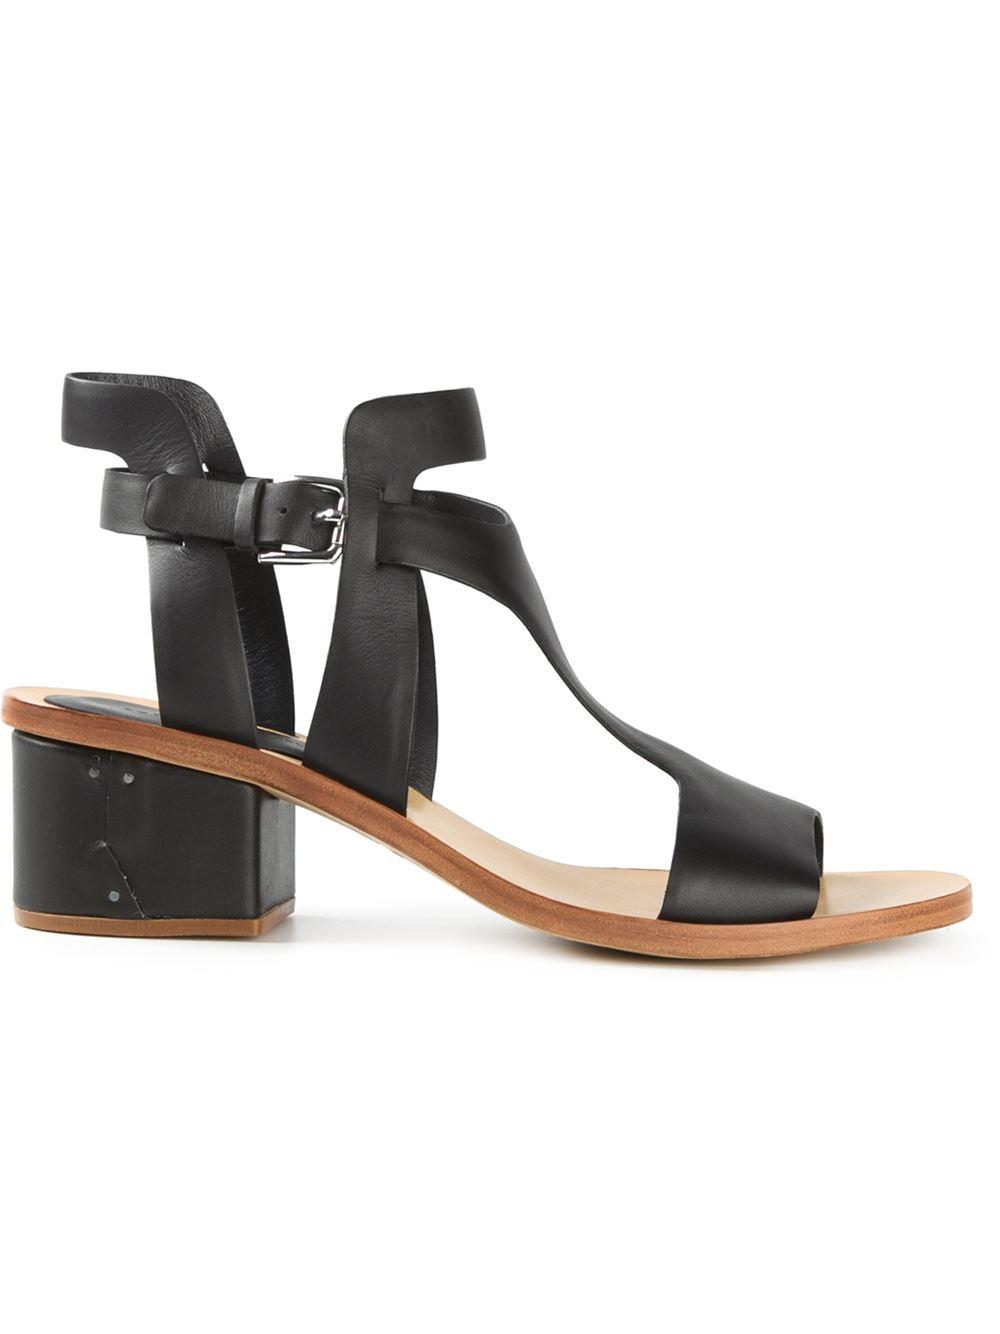 Fantastic Taryn Rose Inger LowHeel Bow Sandals In Black  Lyst